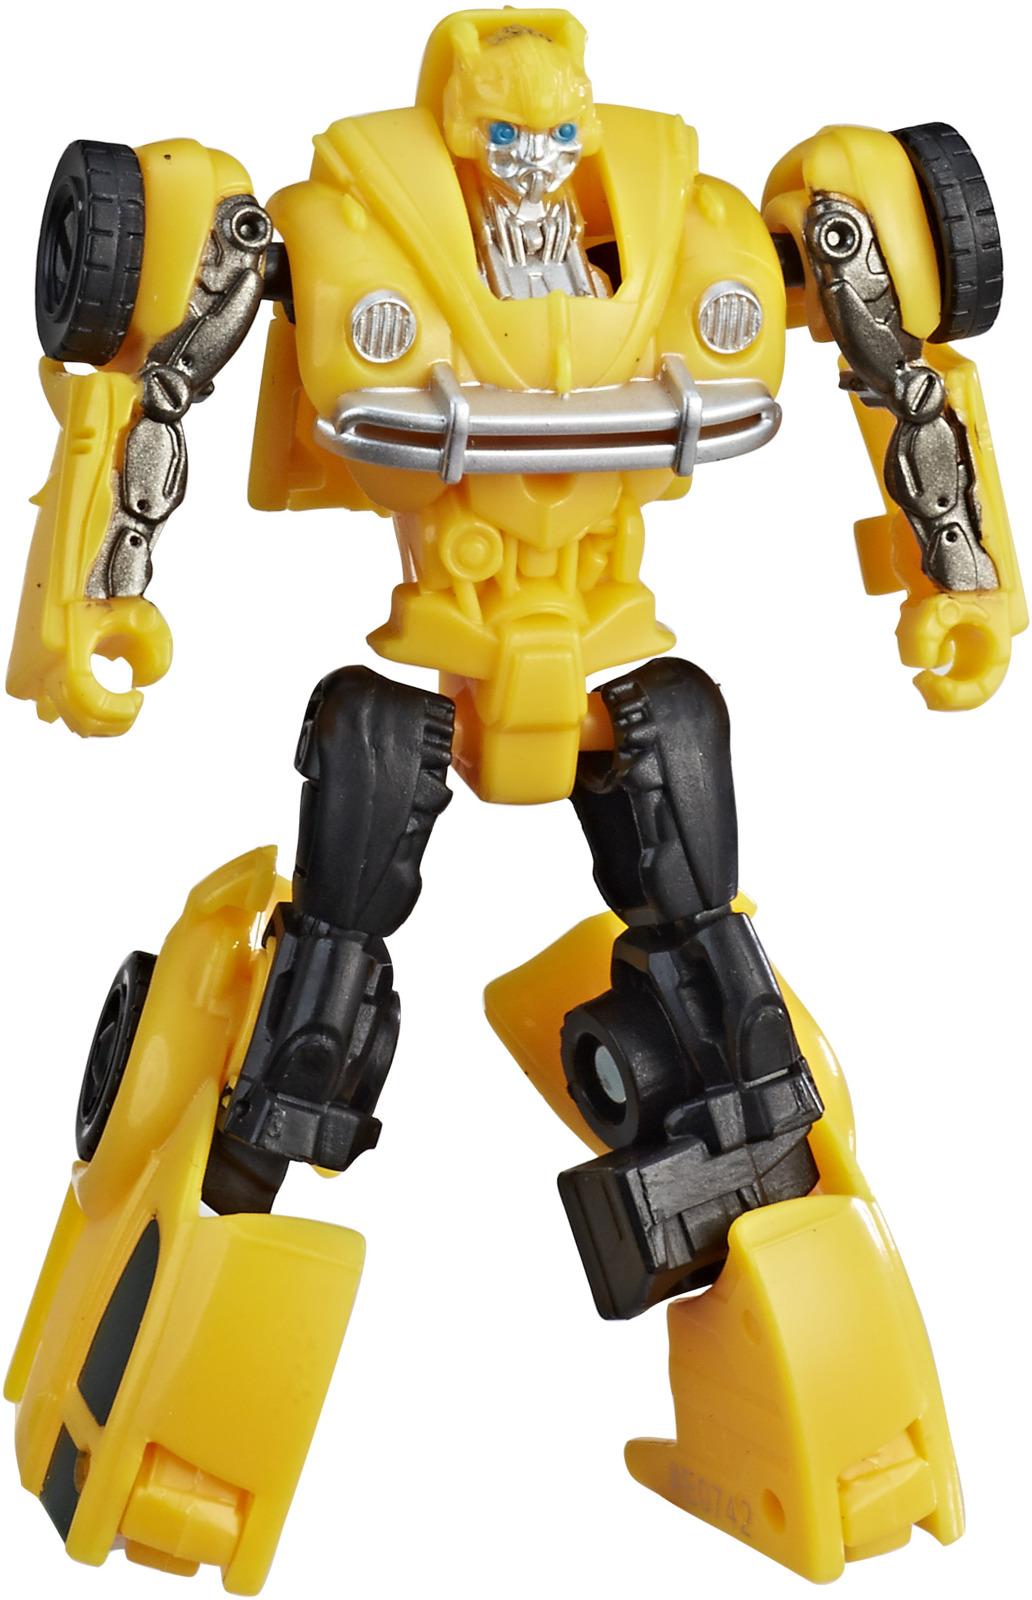 Трансформер Transformers Energon Igniters Bumblebee, E0691_E0742 автомобиль dickie трансформер bumblebee желтый 3113000